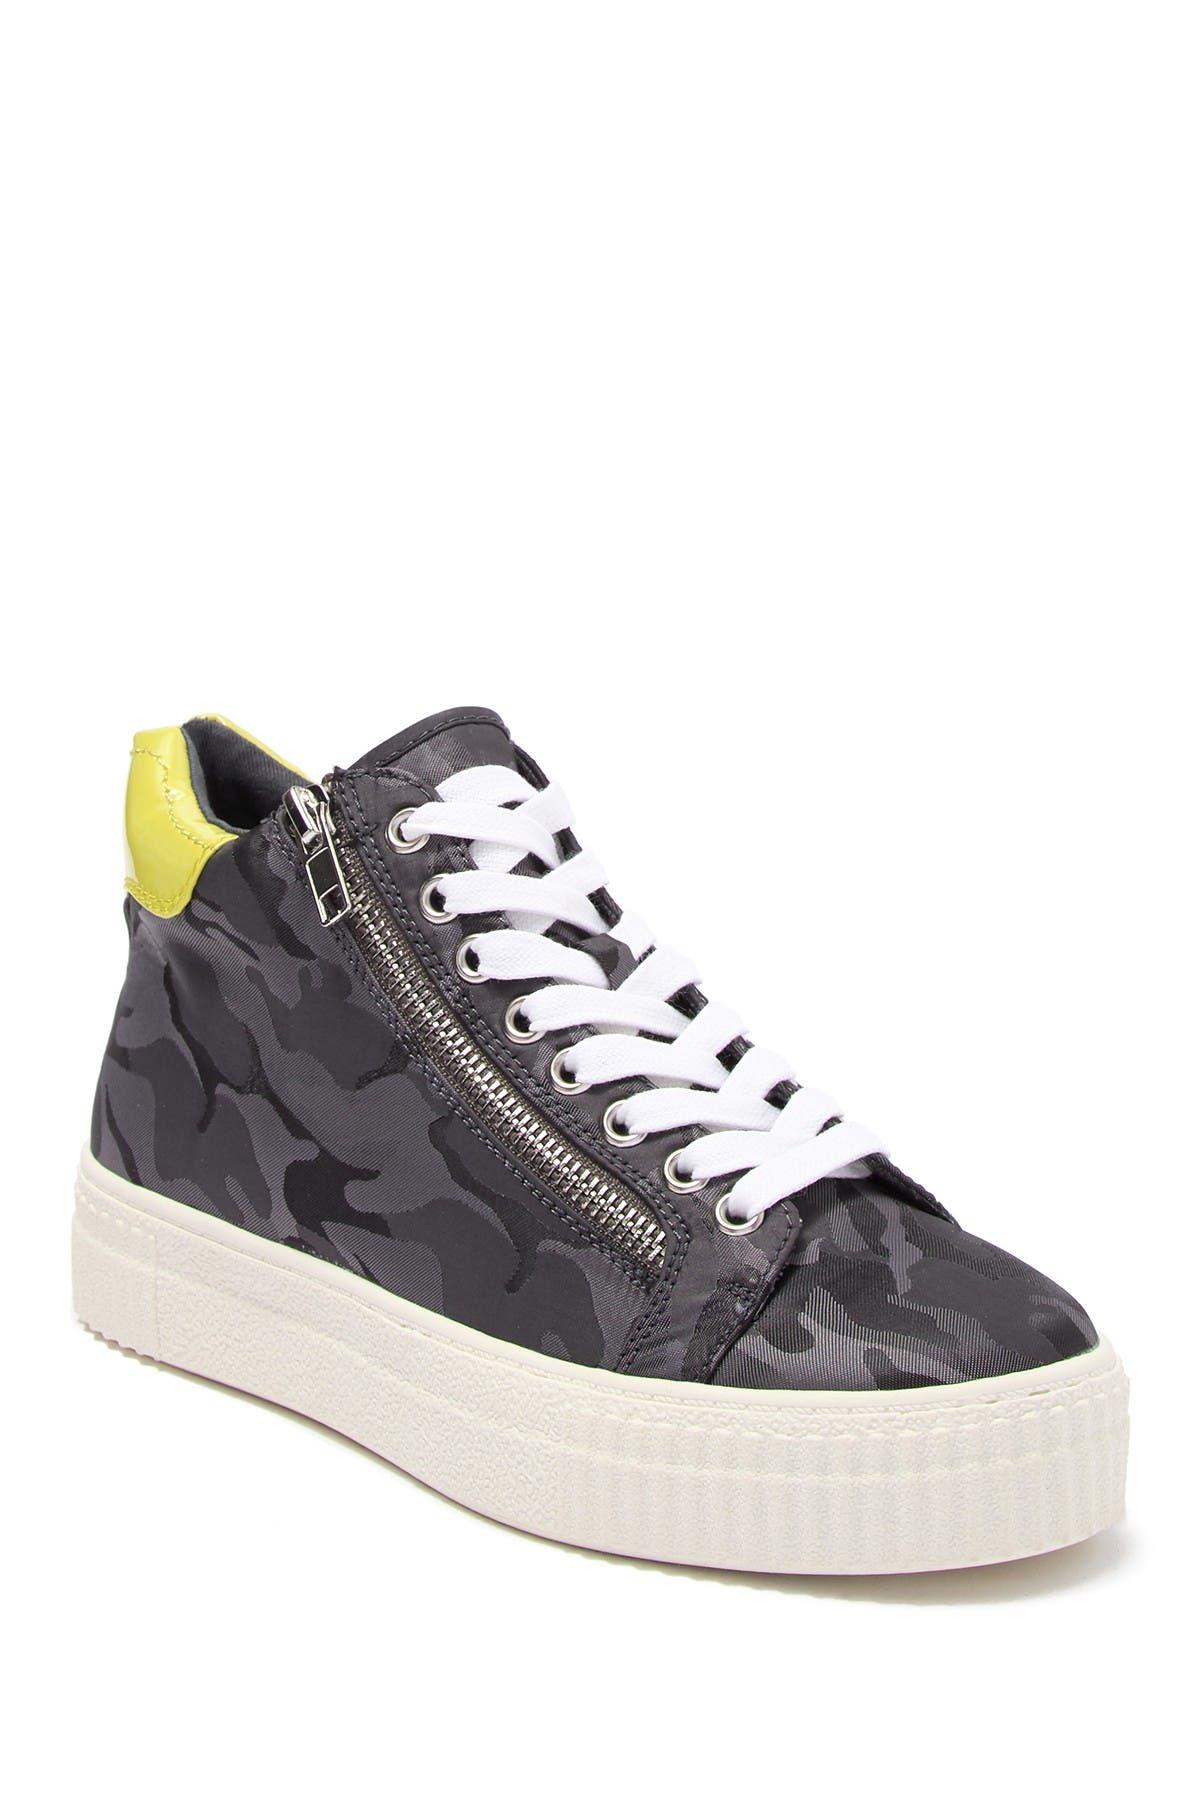 Steve Madden | Zade High-Top Sneaker